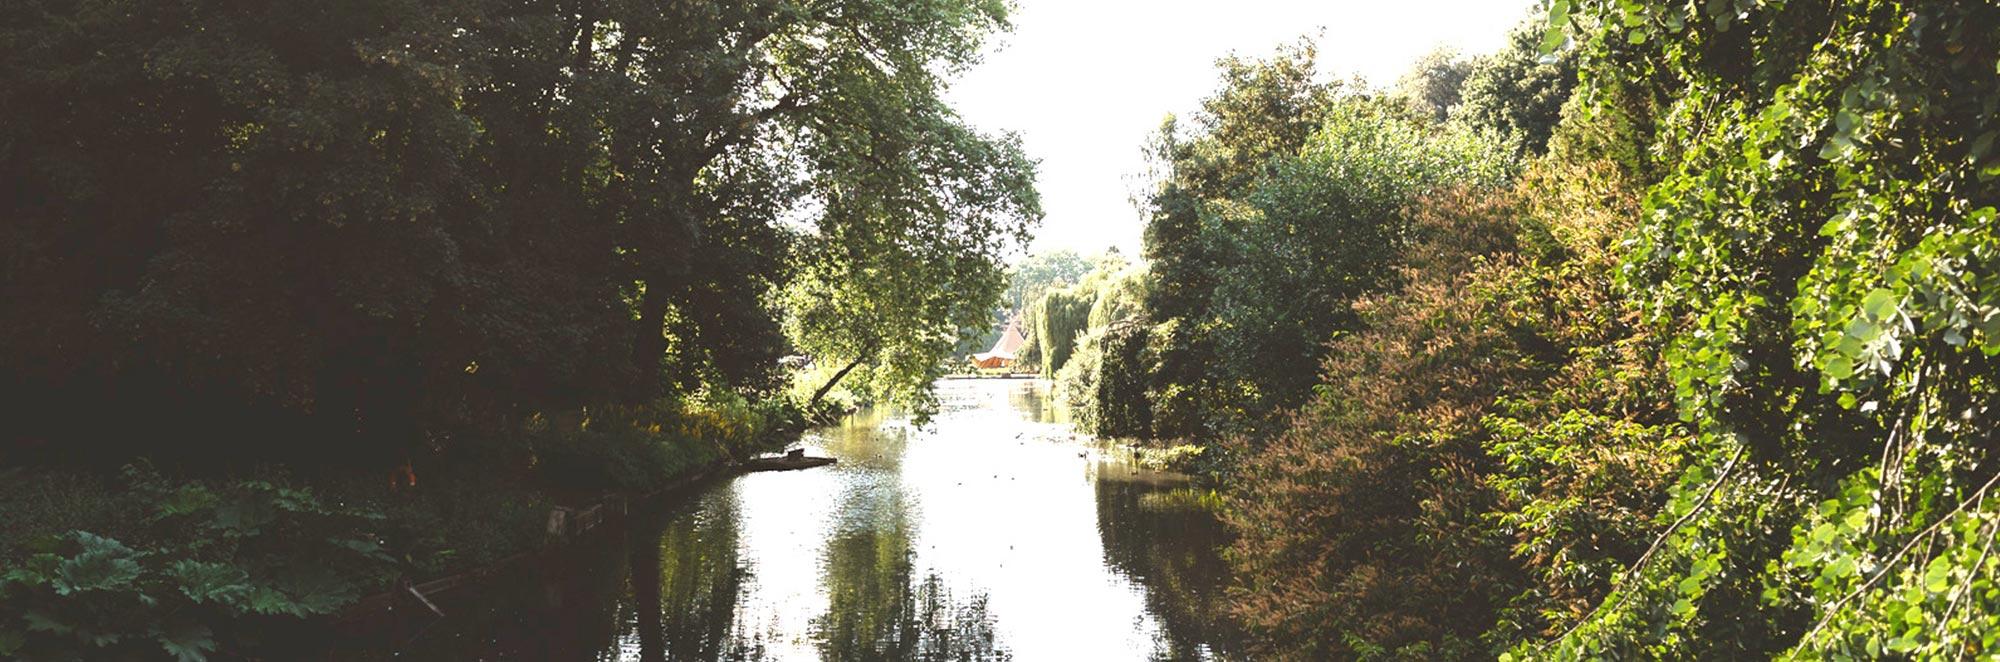 Busbridge Lakes, Godalming